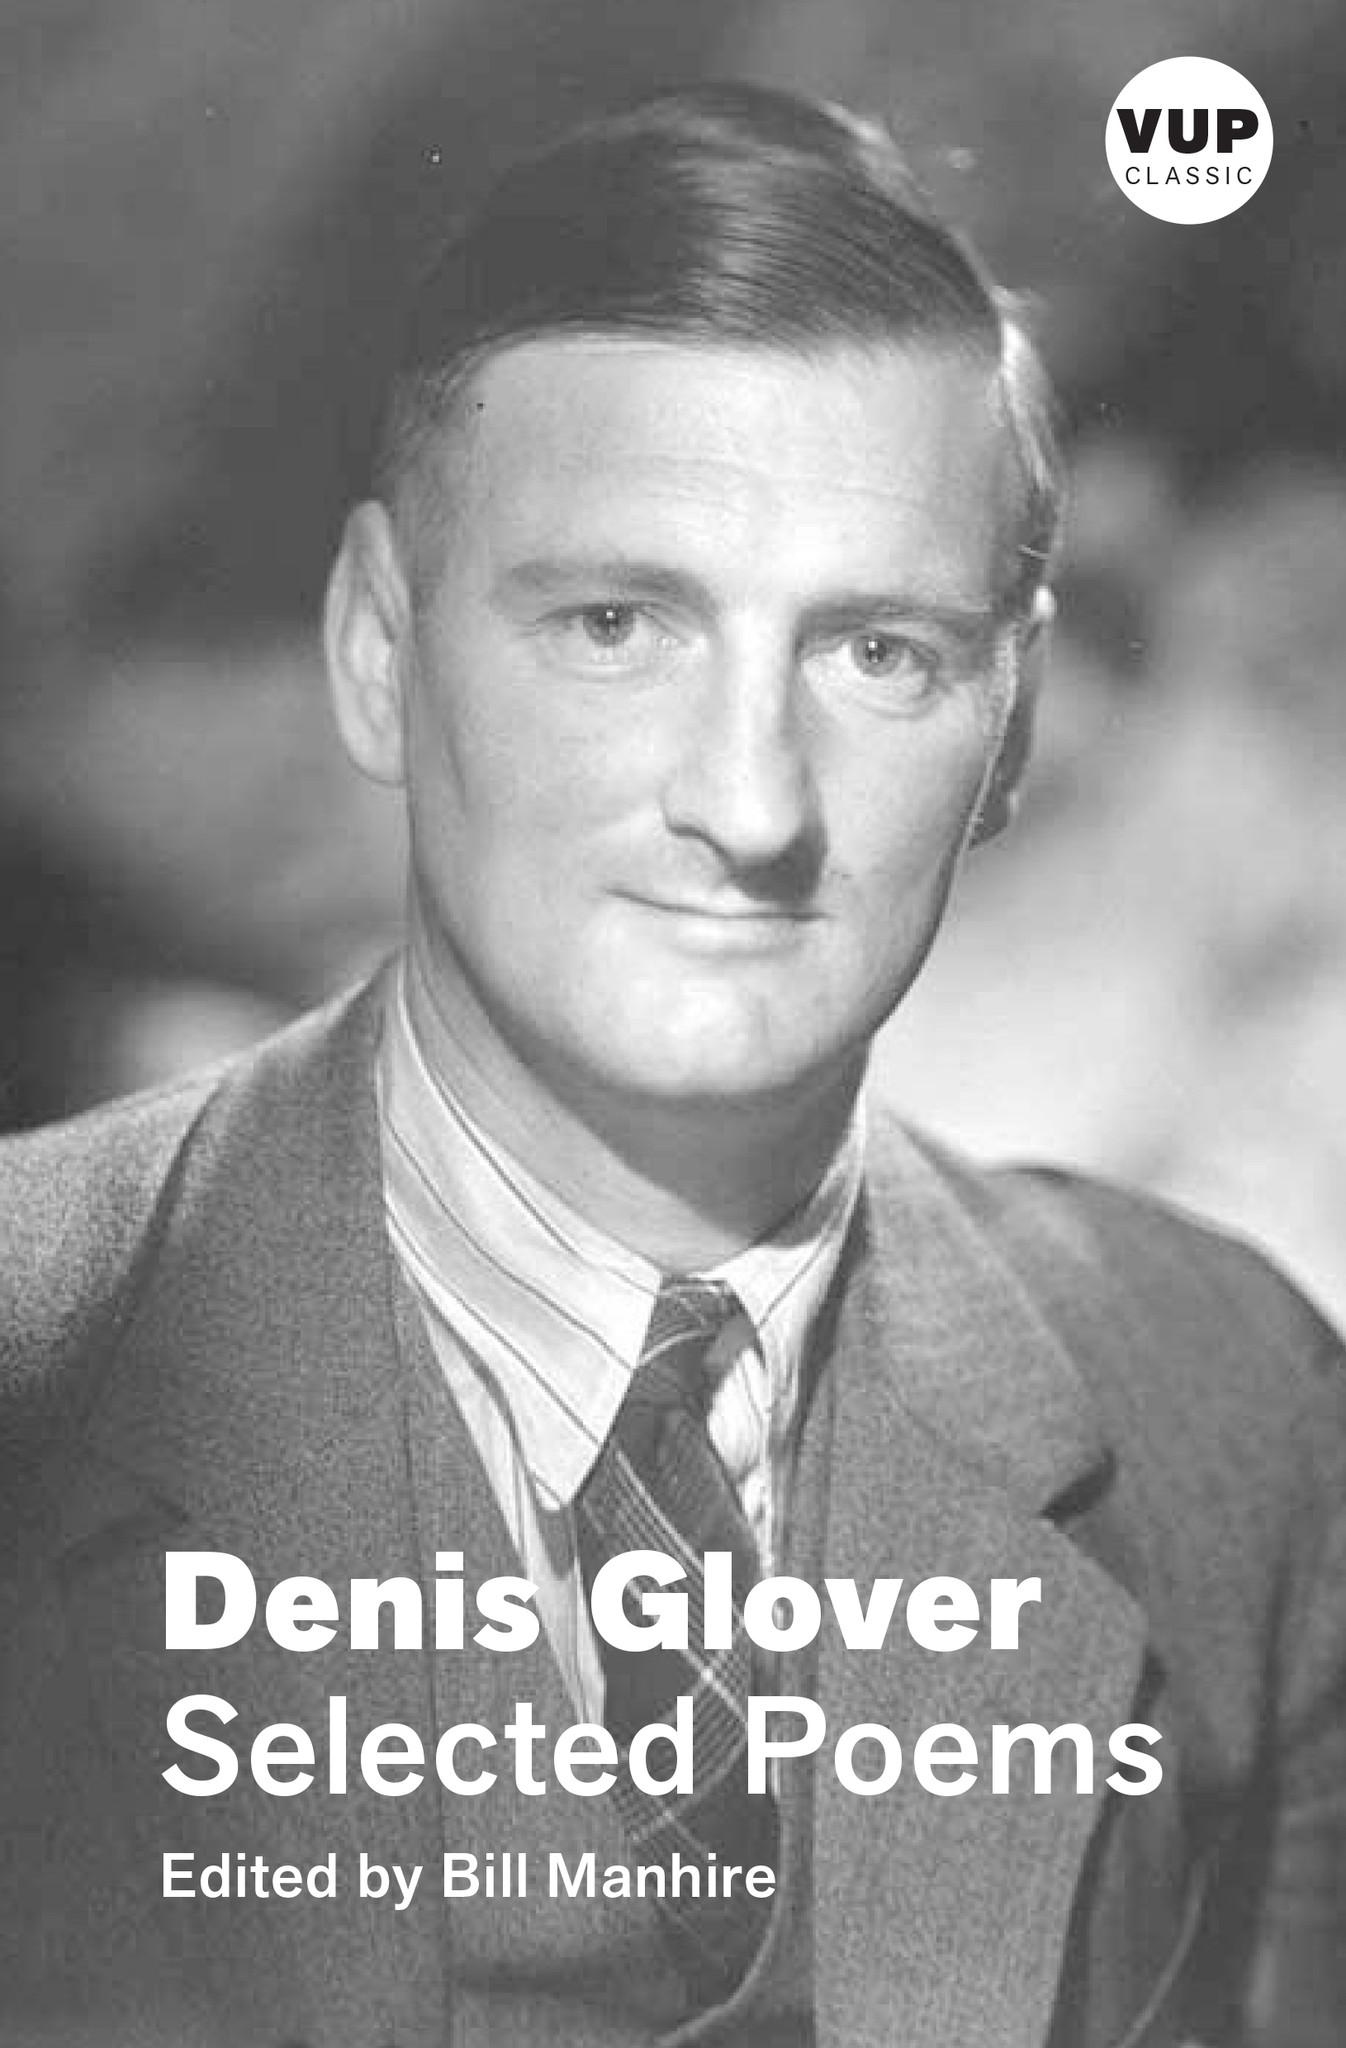 Denis Glover selected poems